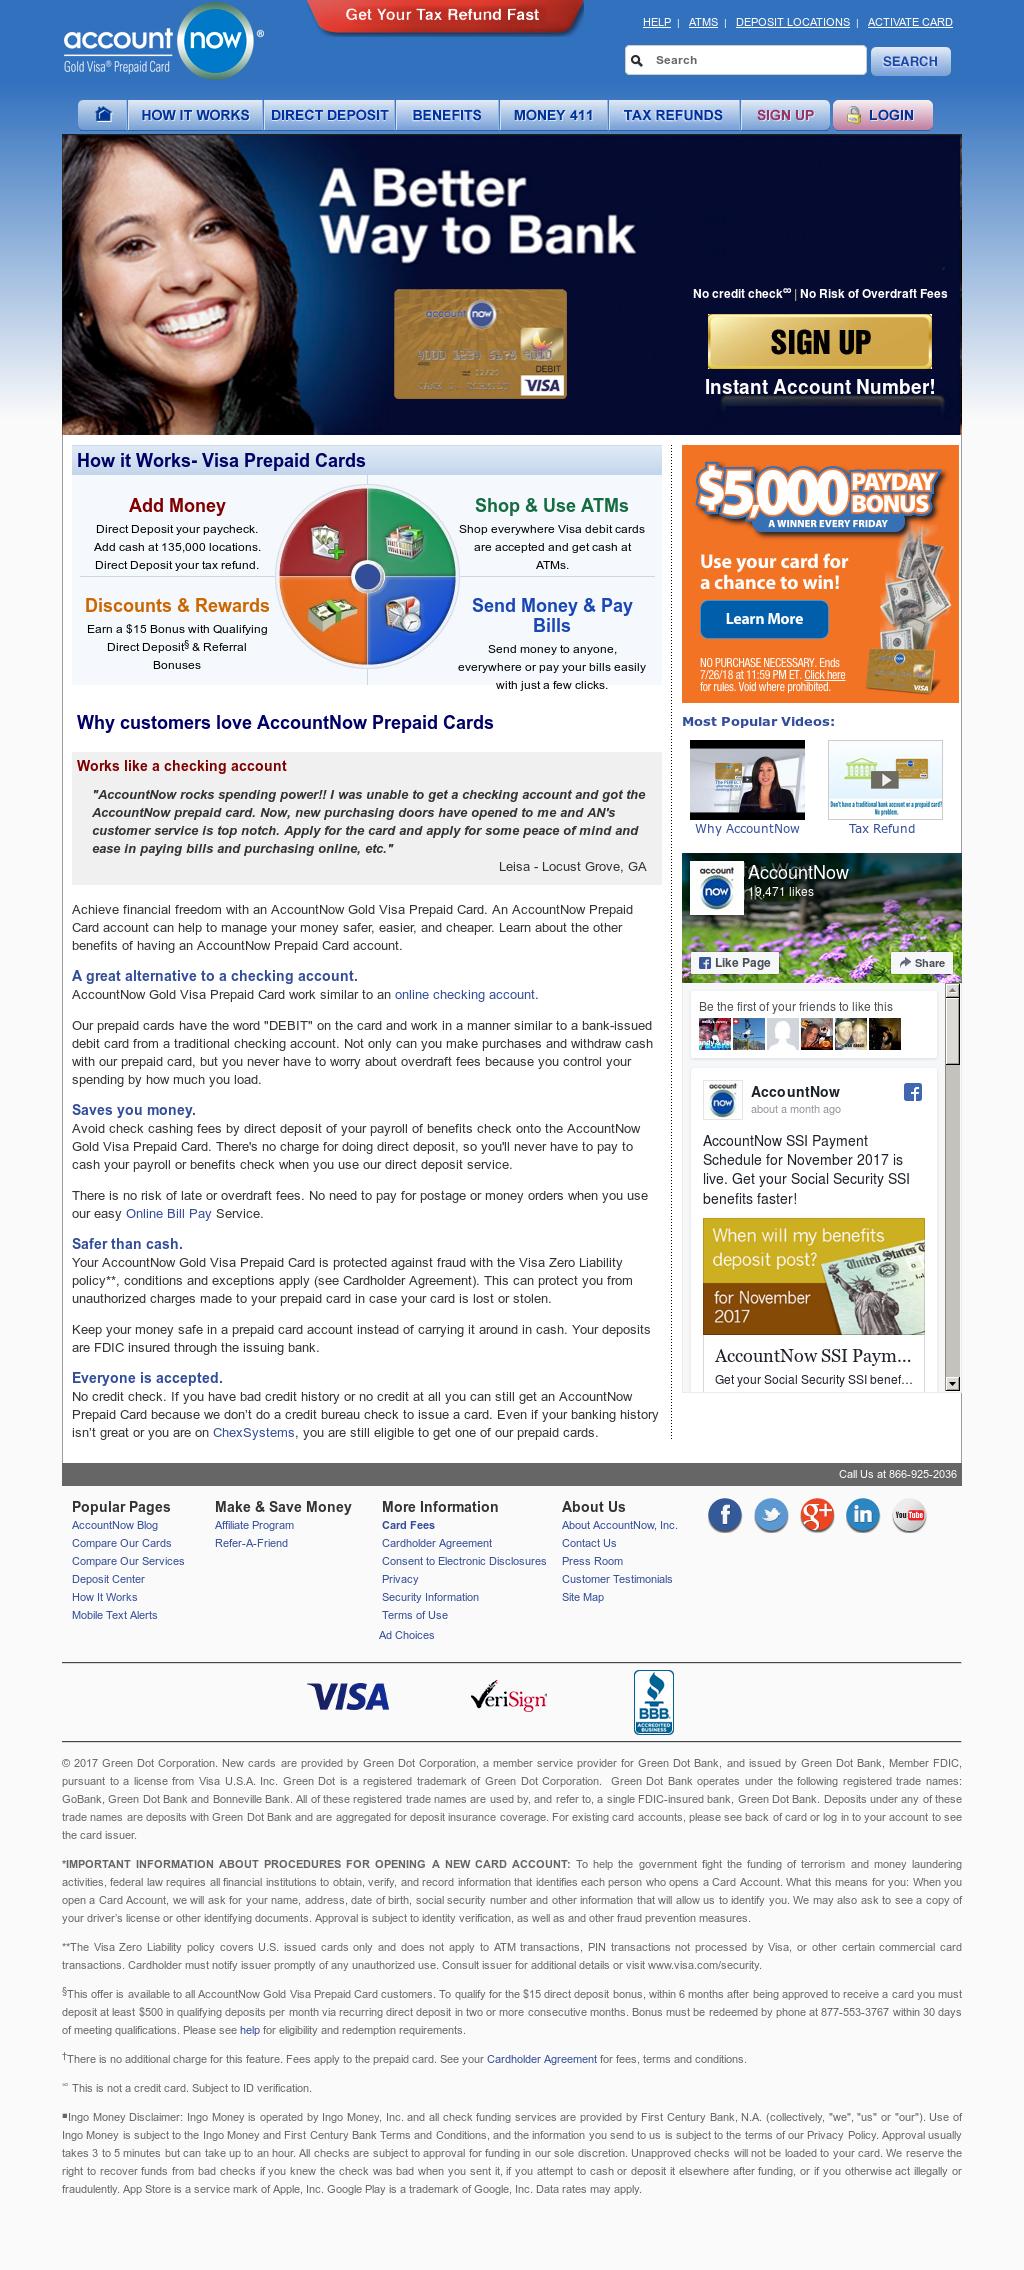 accountnows website screenshot on nov 2017 - Accountnow Gold Visa Prepaid Card